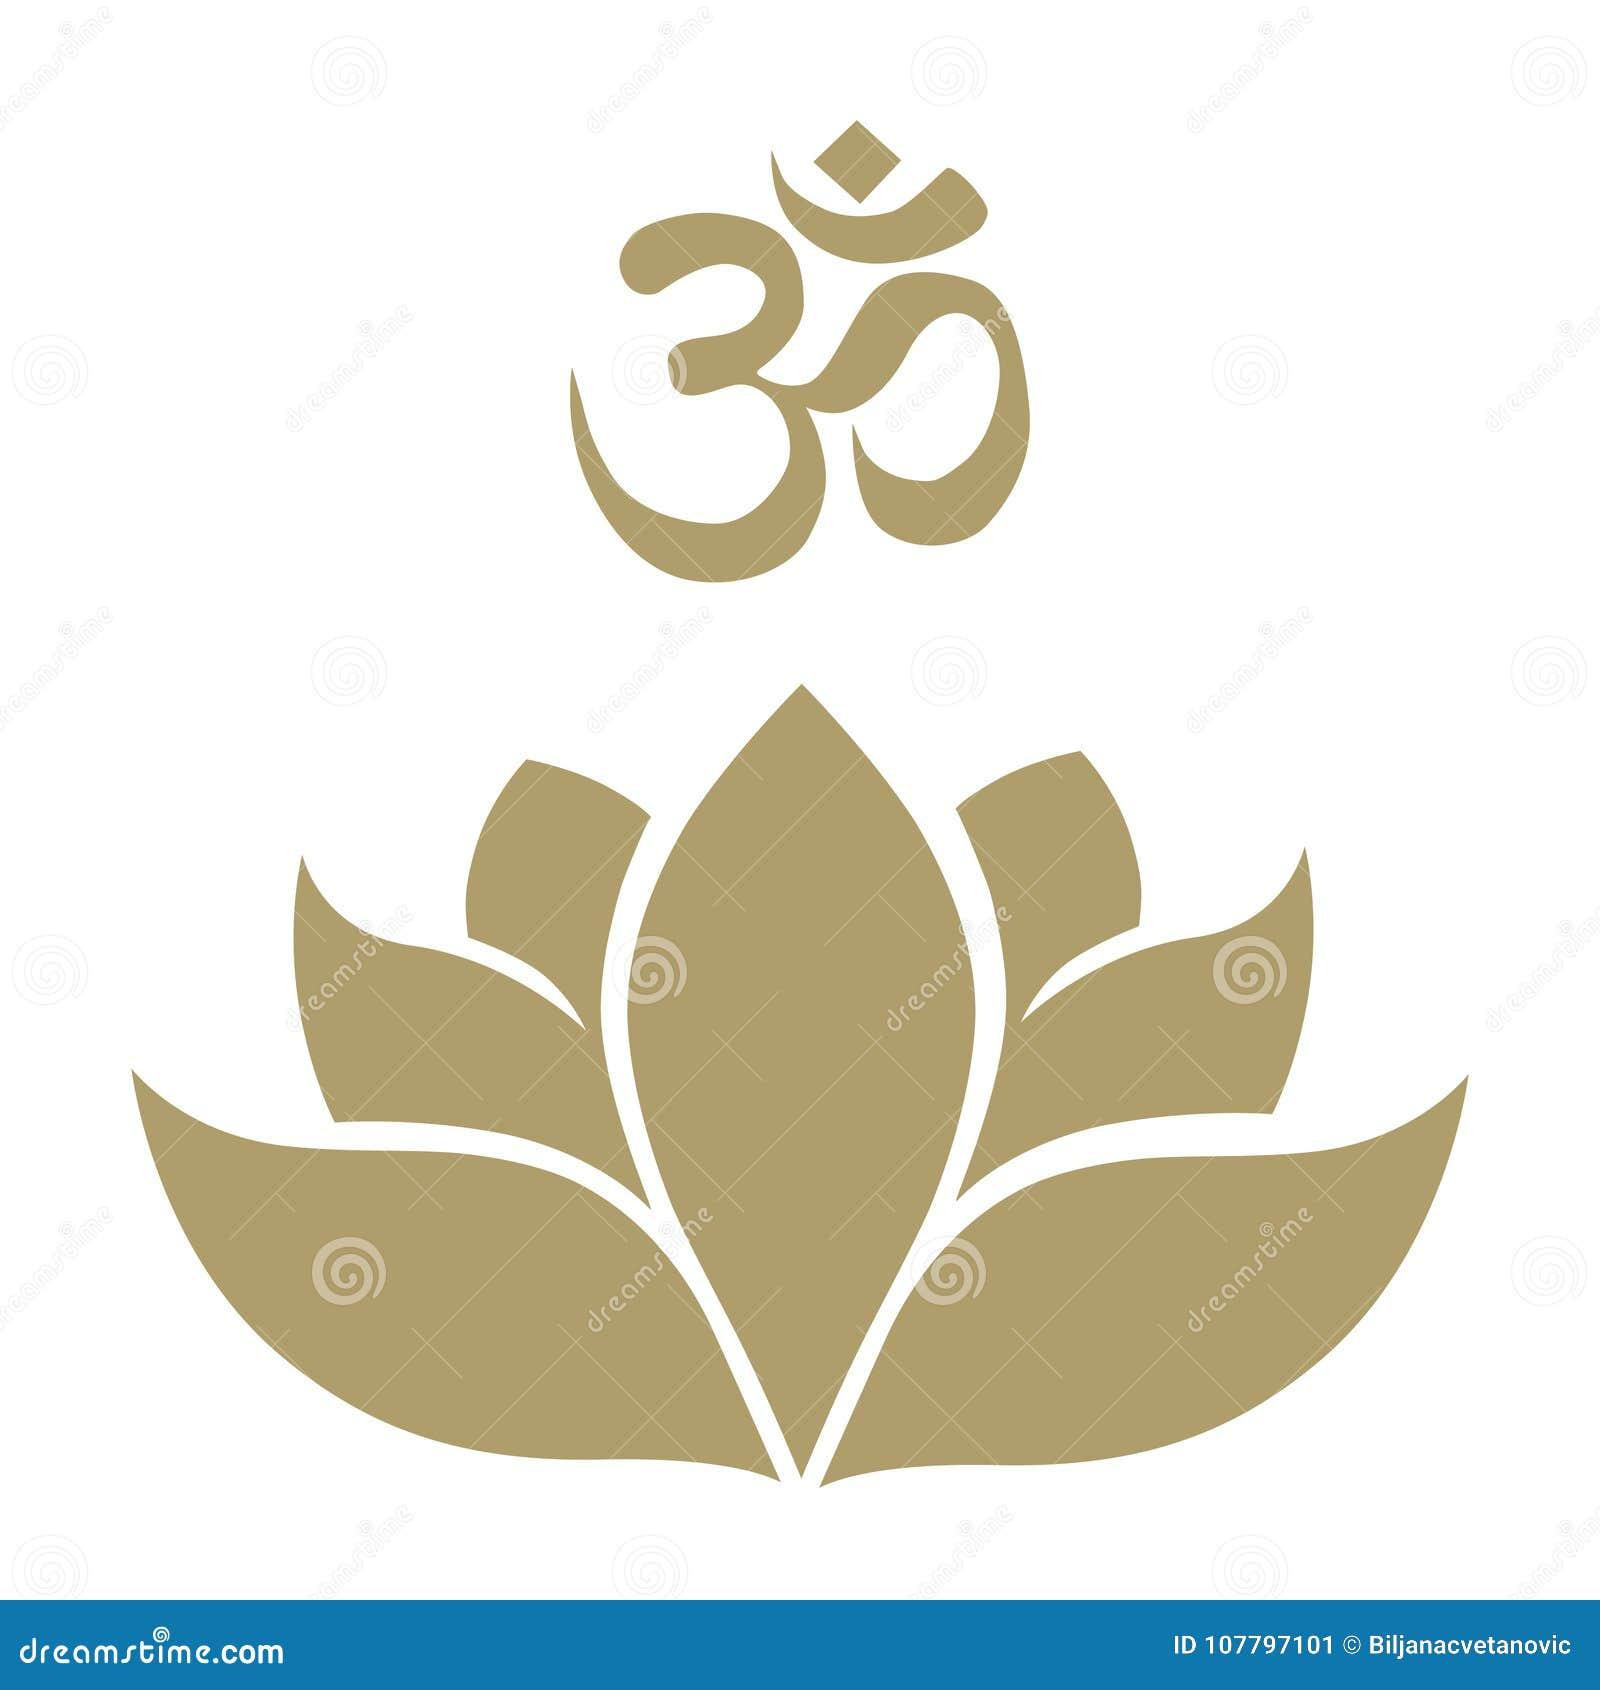 Lotus Flower And Aum Symbol Stock Vector Illustration Of Girl